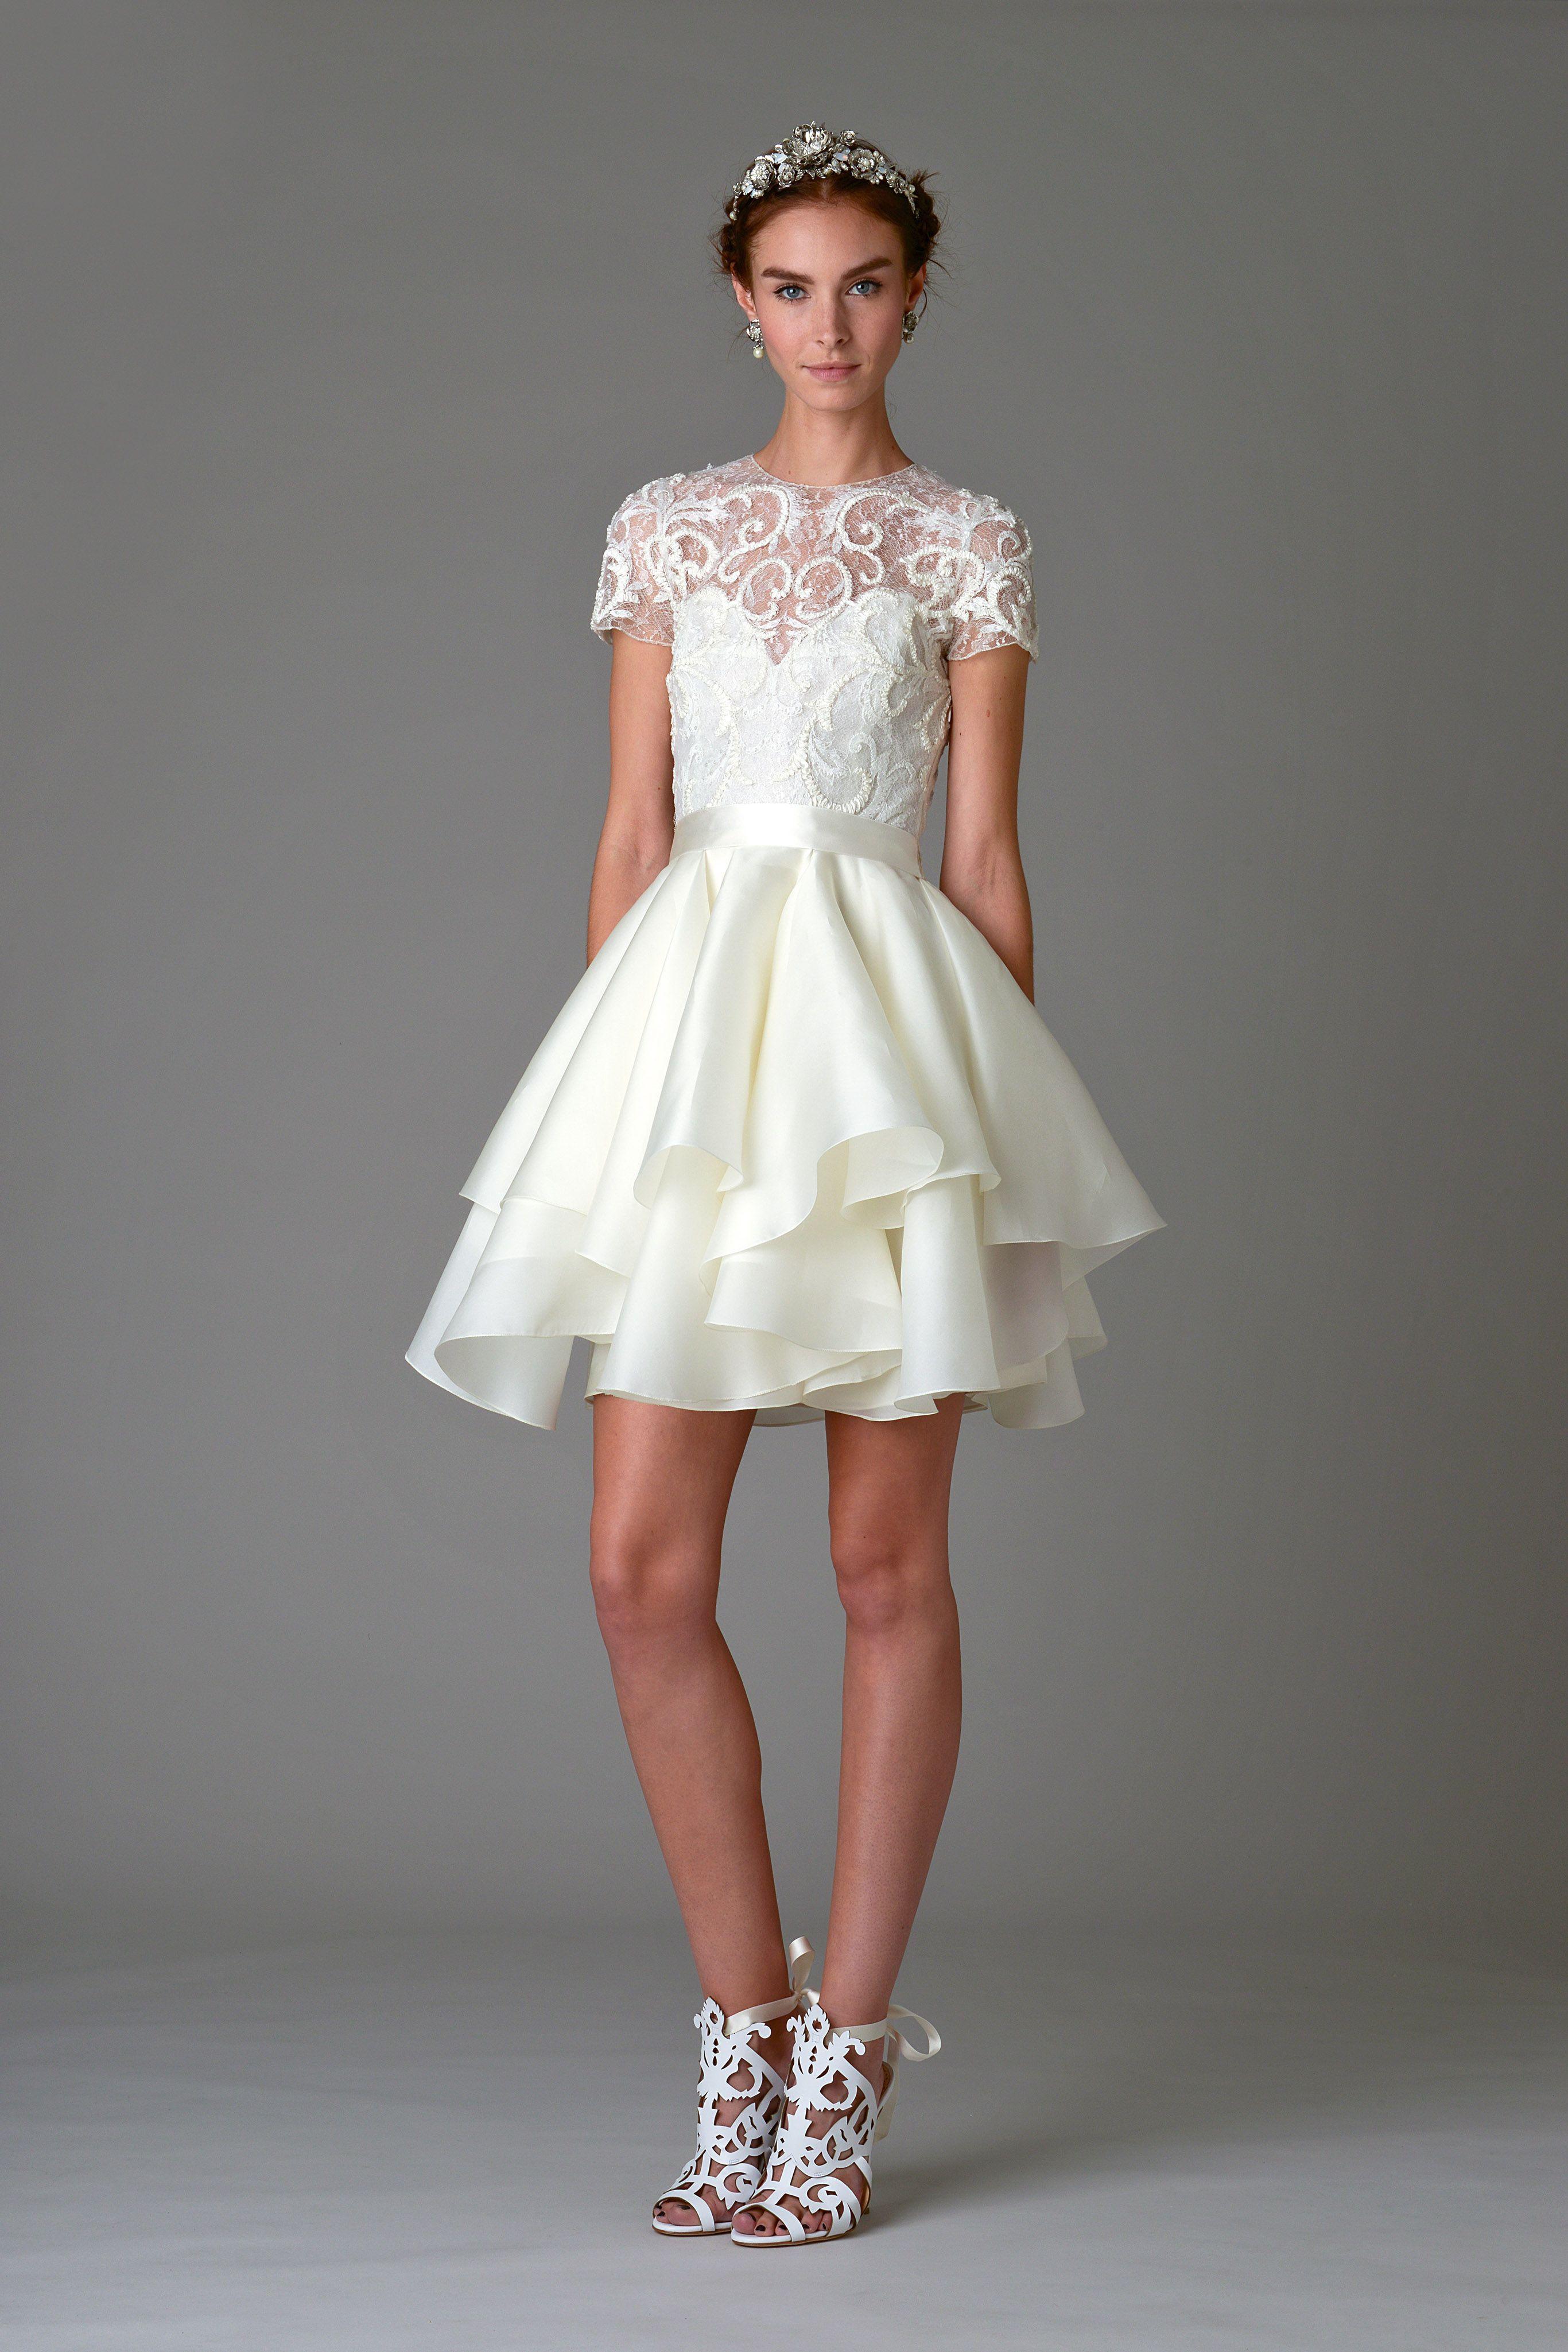 The Best Short Dresses At Bridal Fashion Week Short Wedding Dress Marchesa Bridal Bridal Fashion Week [ 4098 x 2732 Pixel ]